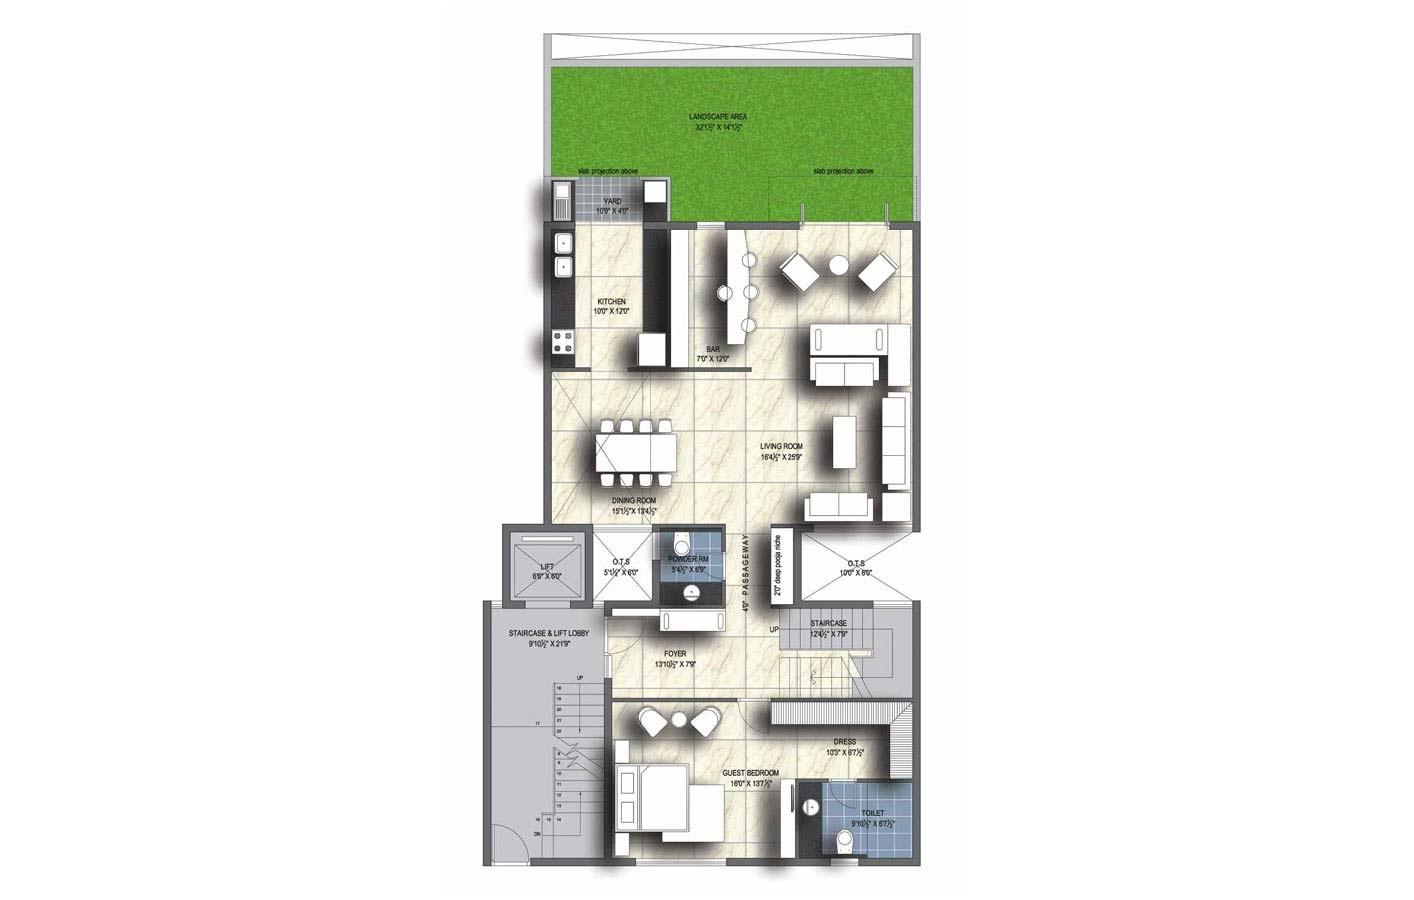 unitech uniworld resort apartment 4bhk 3597sqft41